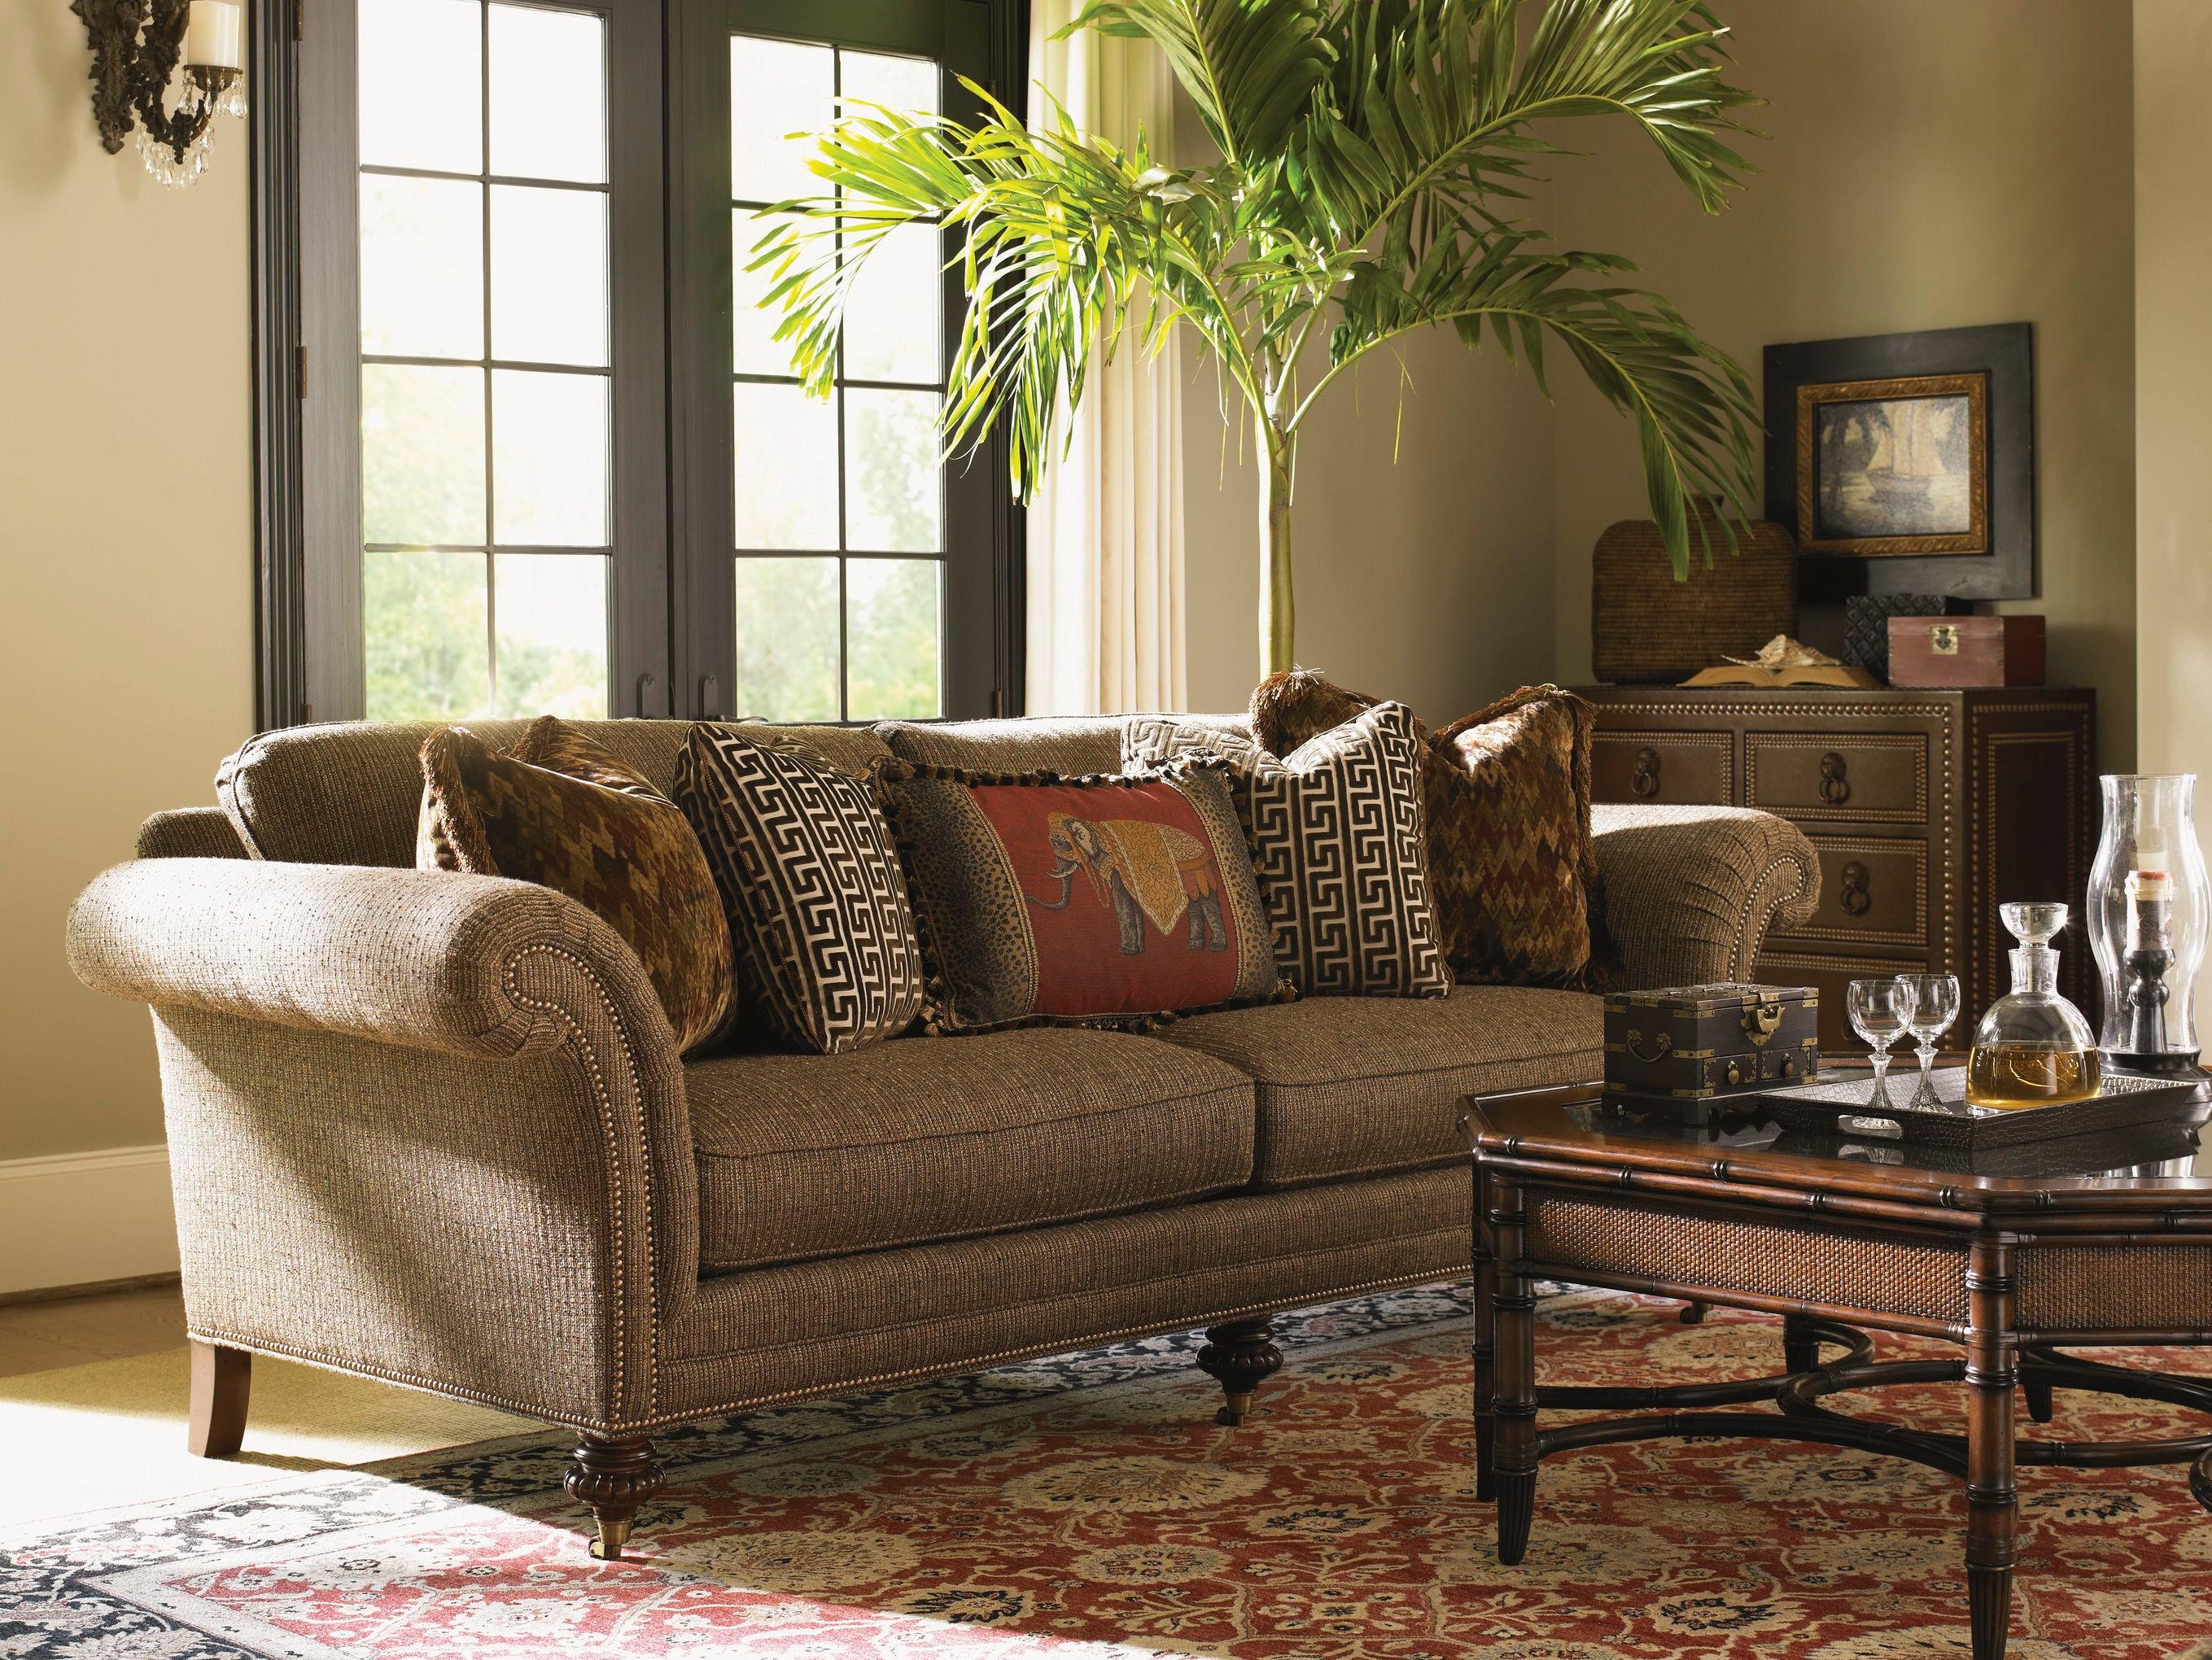 tommy bahama living room modern furniture sets home southport sofa 7719 33 creative